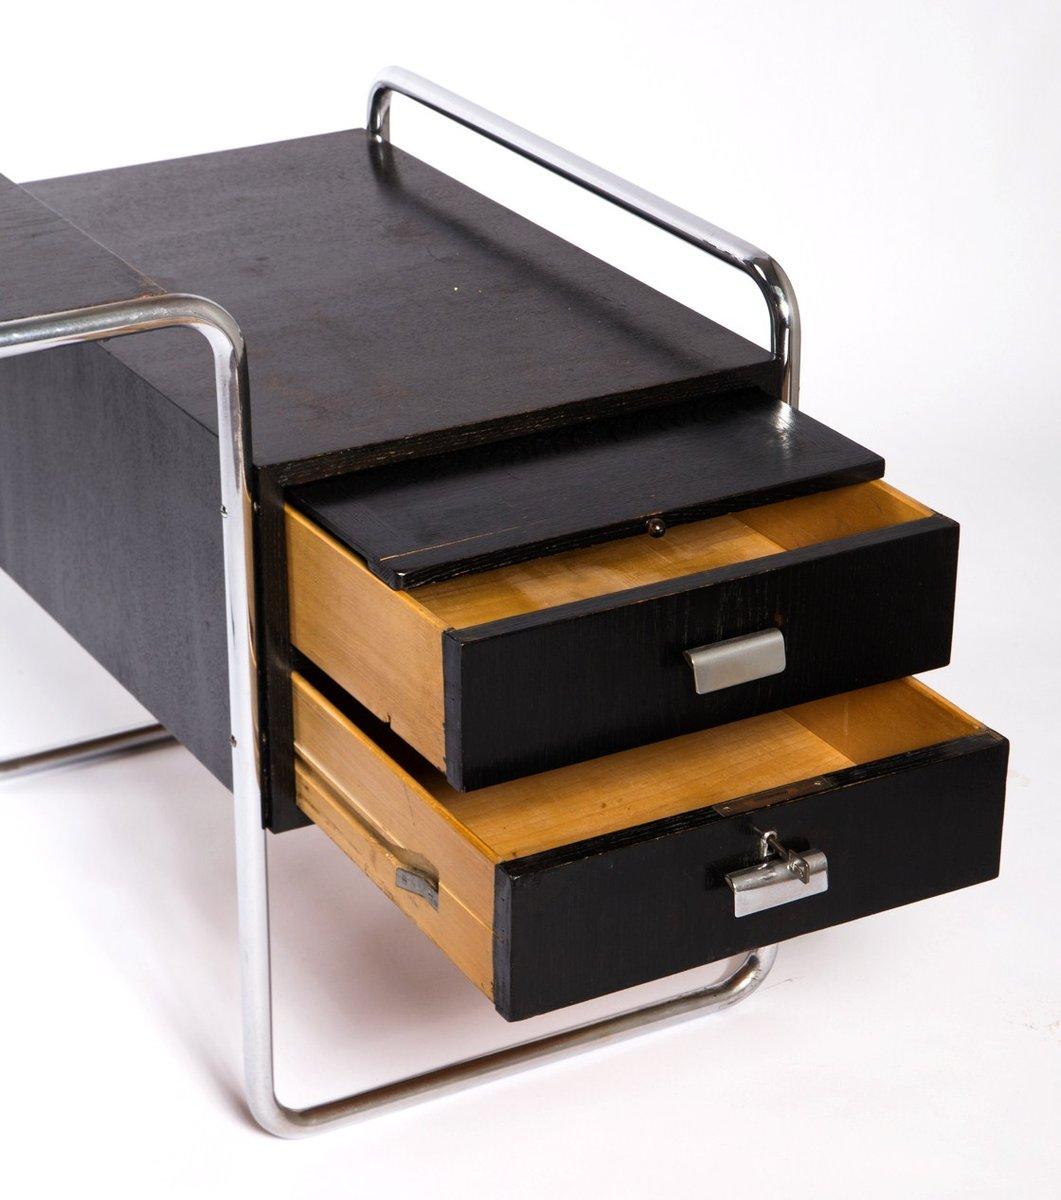 B65 Writing Desk By Marcel Breuer For Thonet, 1930s